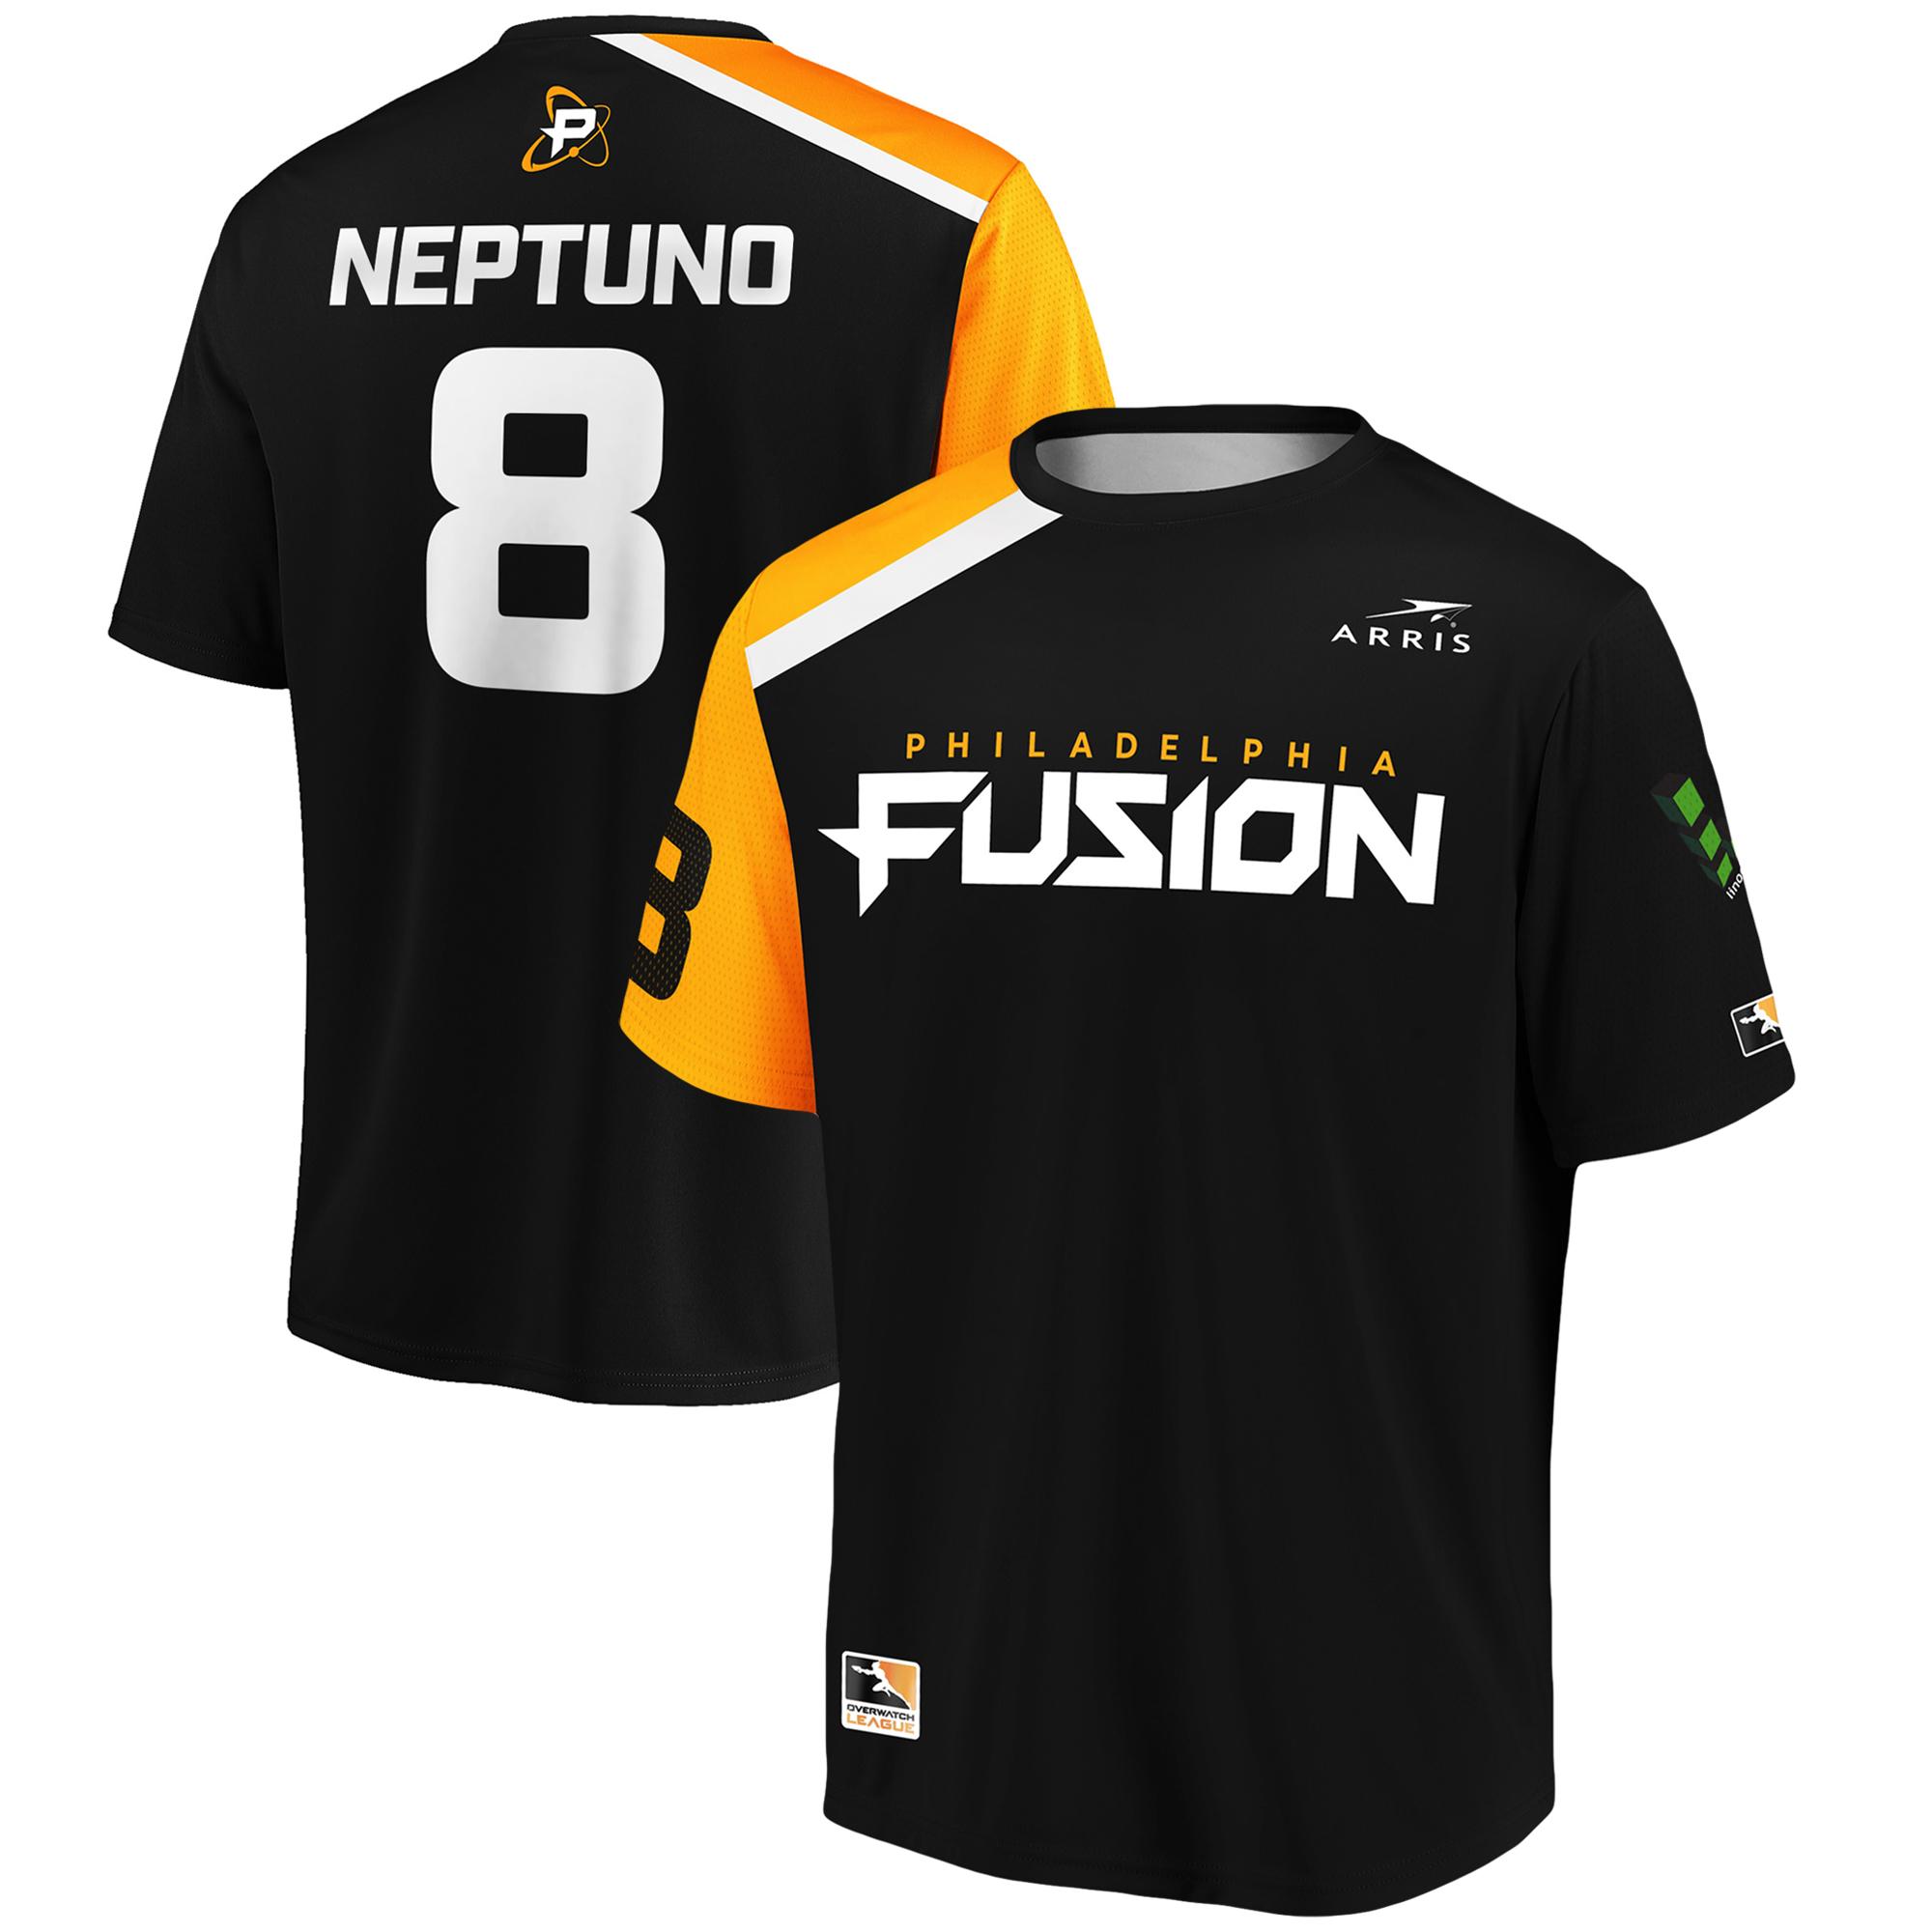 neptuNo Philadelphia Fusion Overwatch League Replica Home Jersey - Black